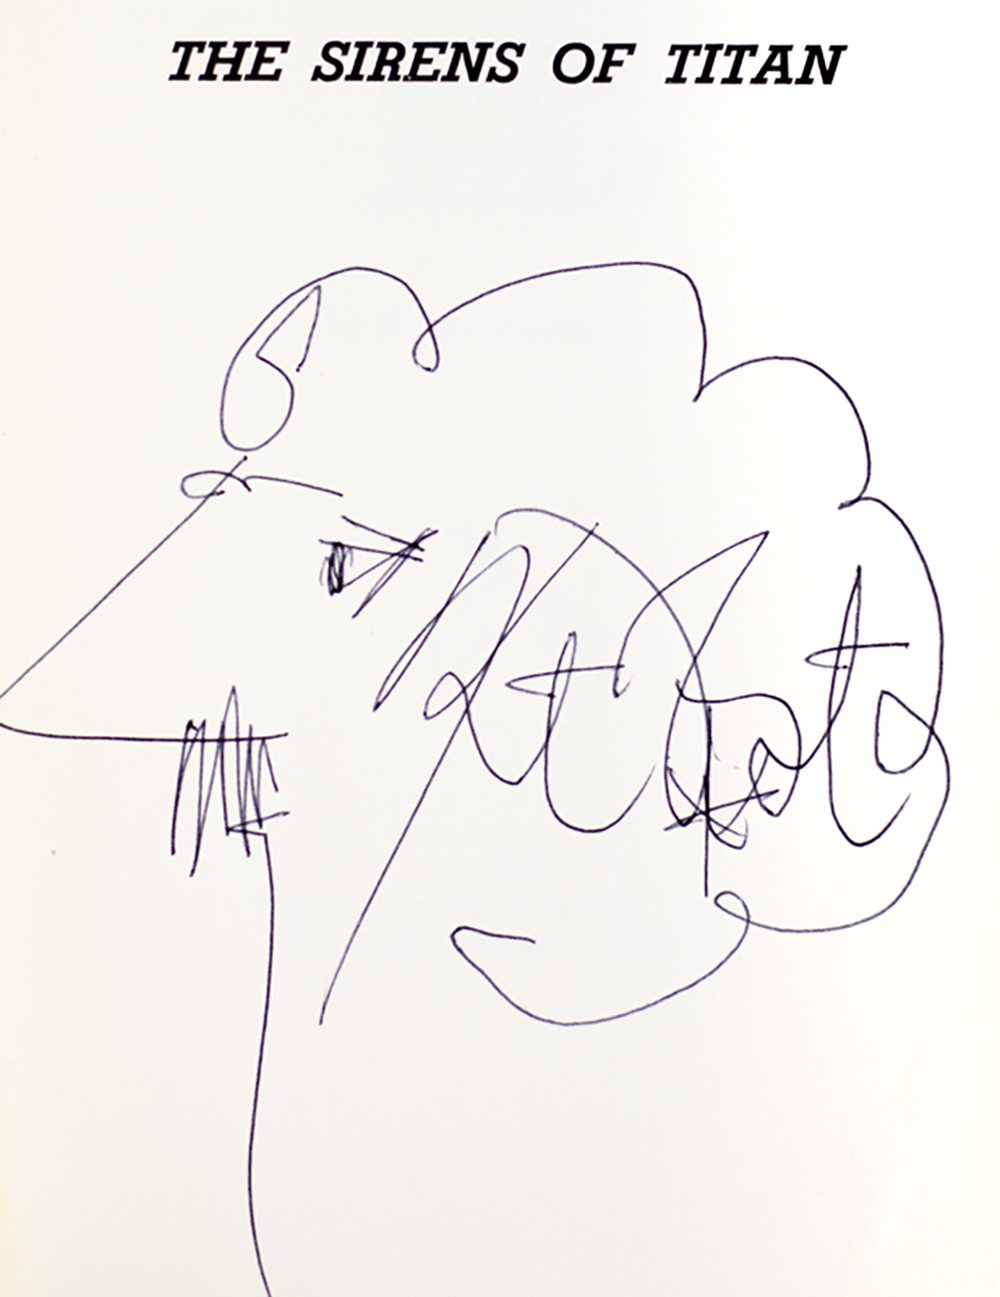 Sirens of Titans Kurt Vonnegut First Edition Signed Rare Book